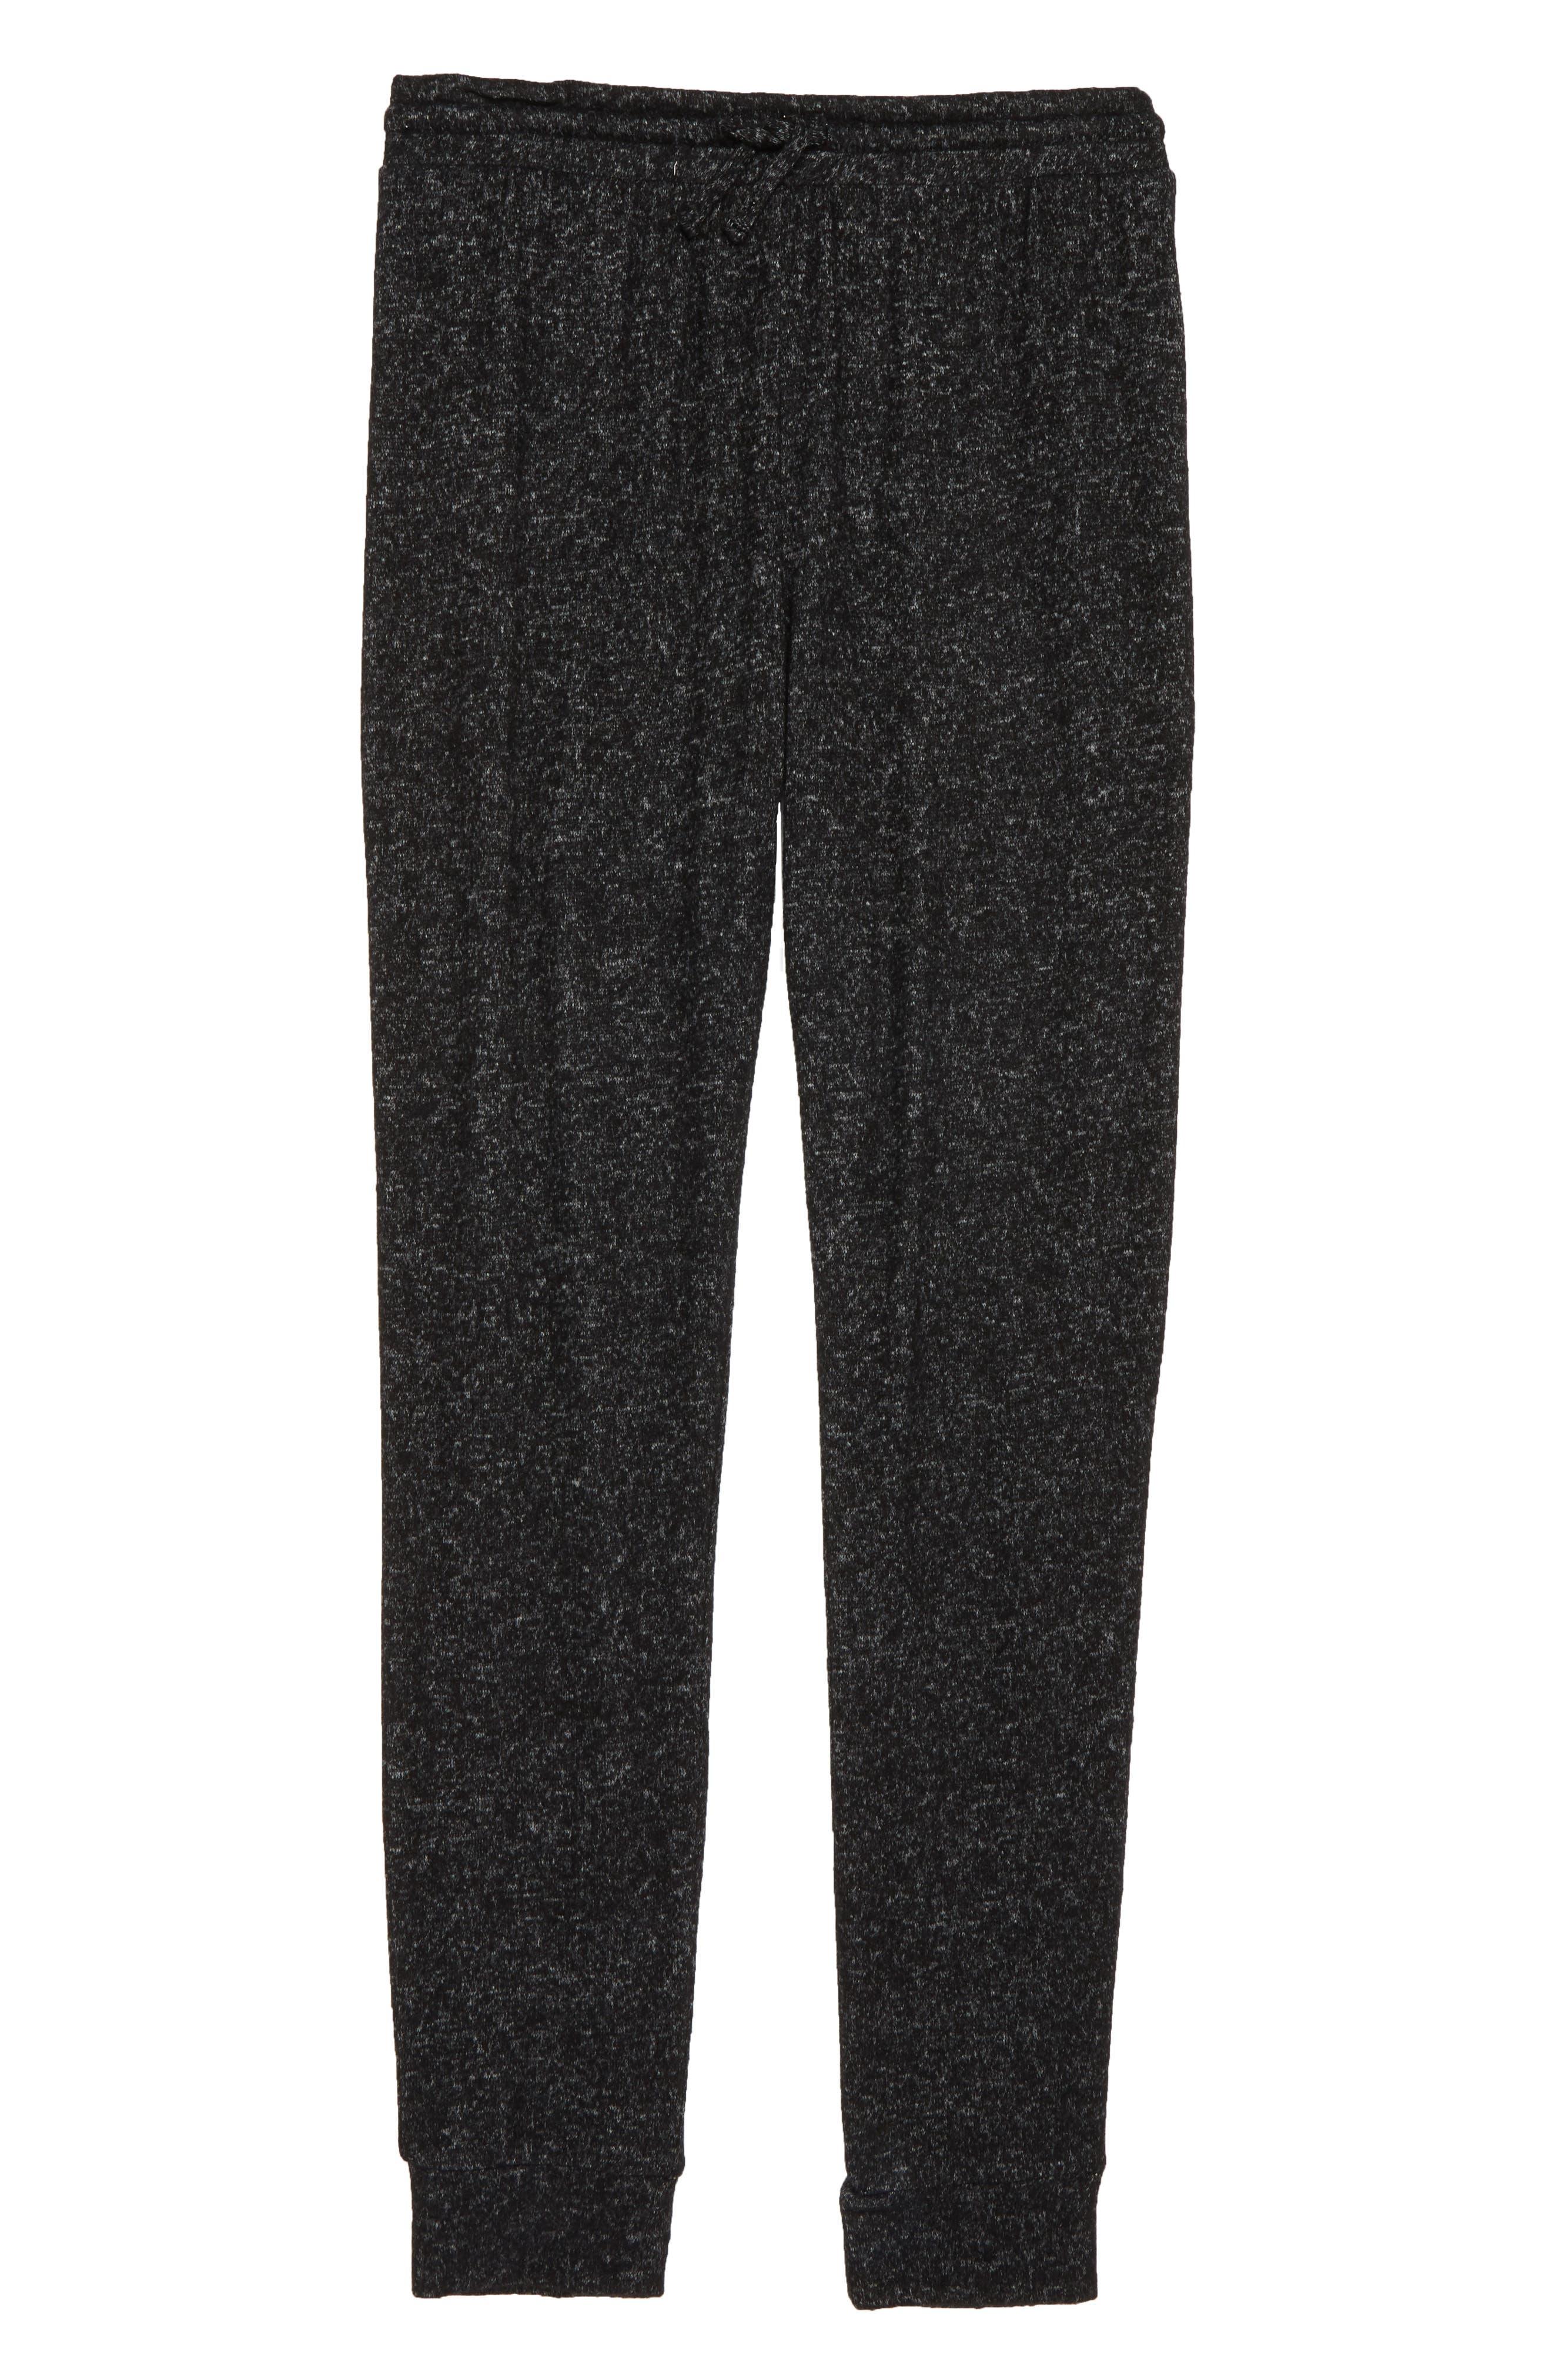 Jogger Pants,                         Main,                         color, BLACK HEATHER